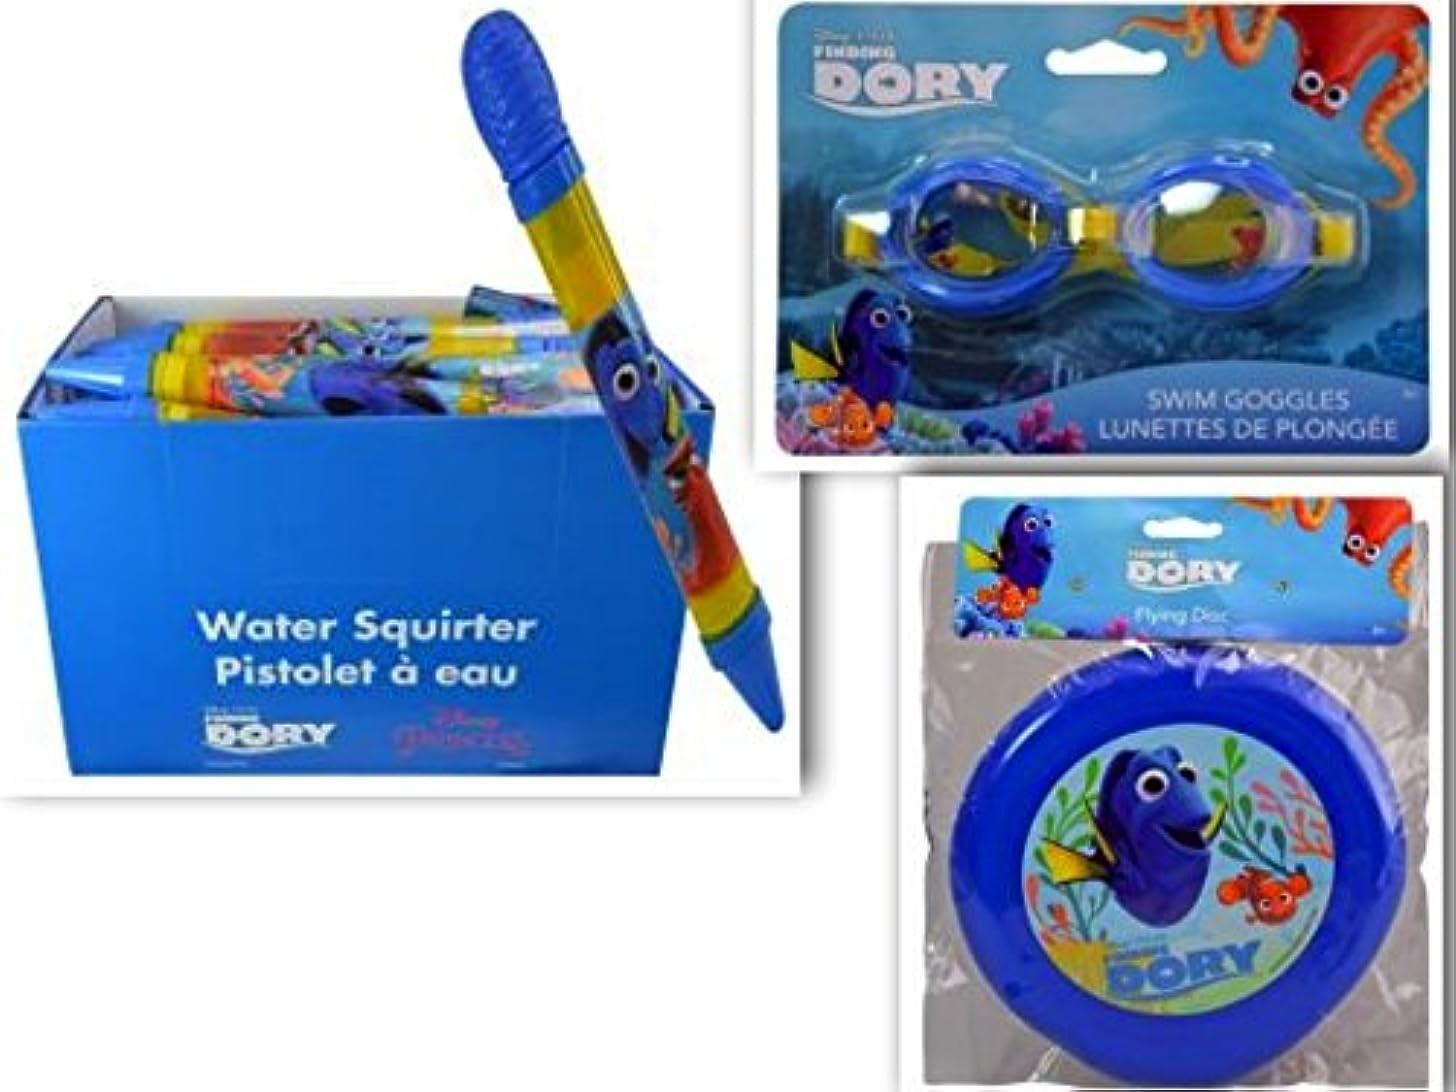 FAVORITE Finding Dory Disney Beach and Pool 3 Piece Swim & Playdate Bundle: 3 Items- Water Blaster, Flying Disc, & Splash Goggles